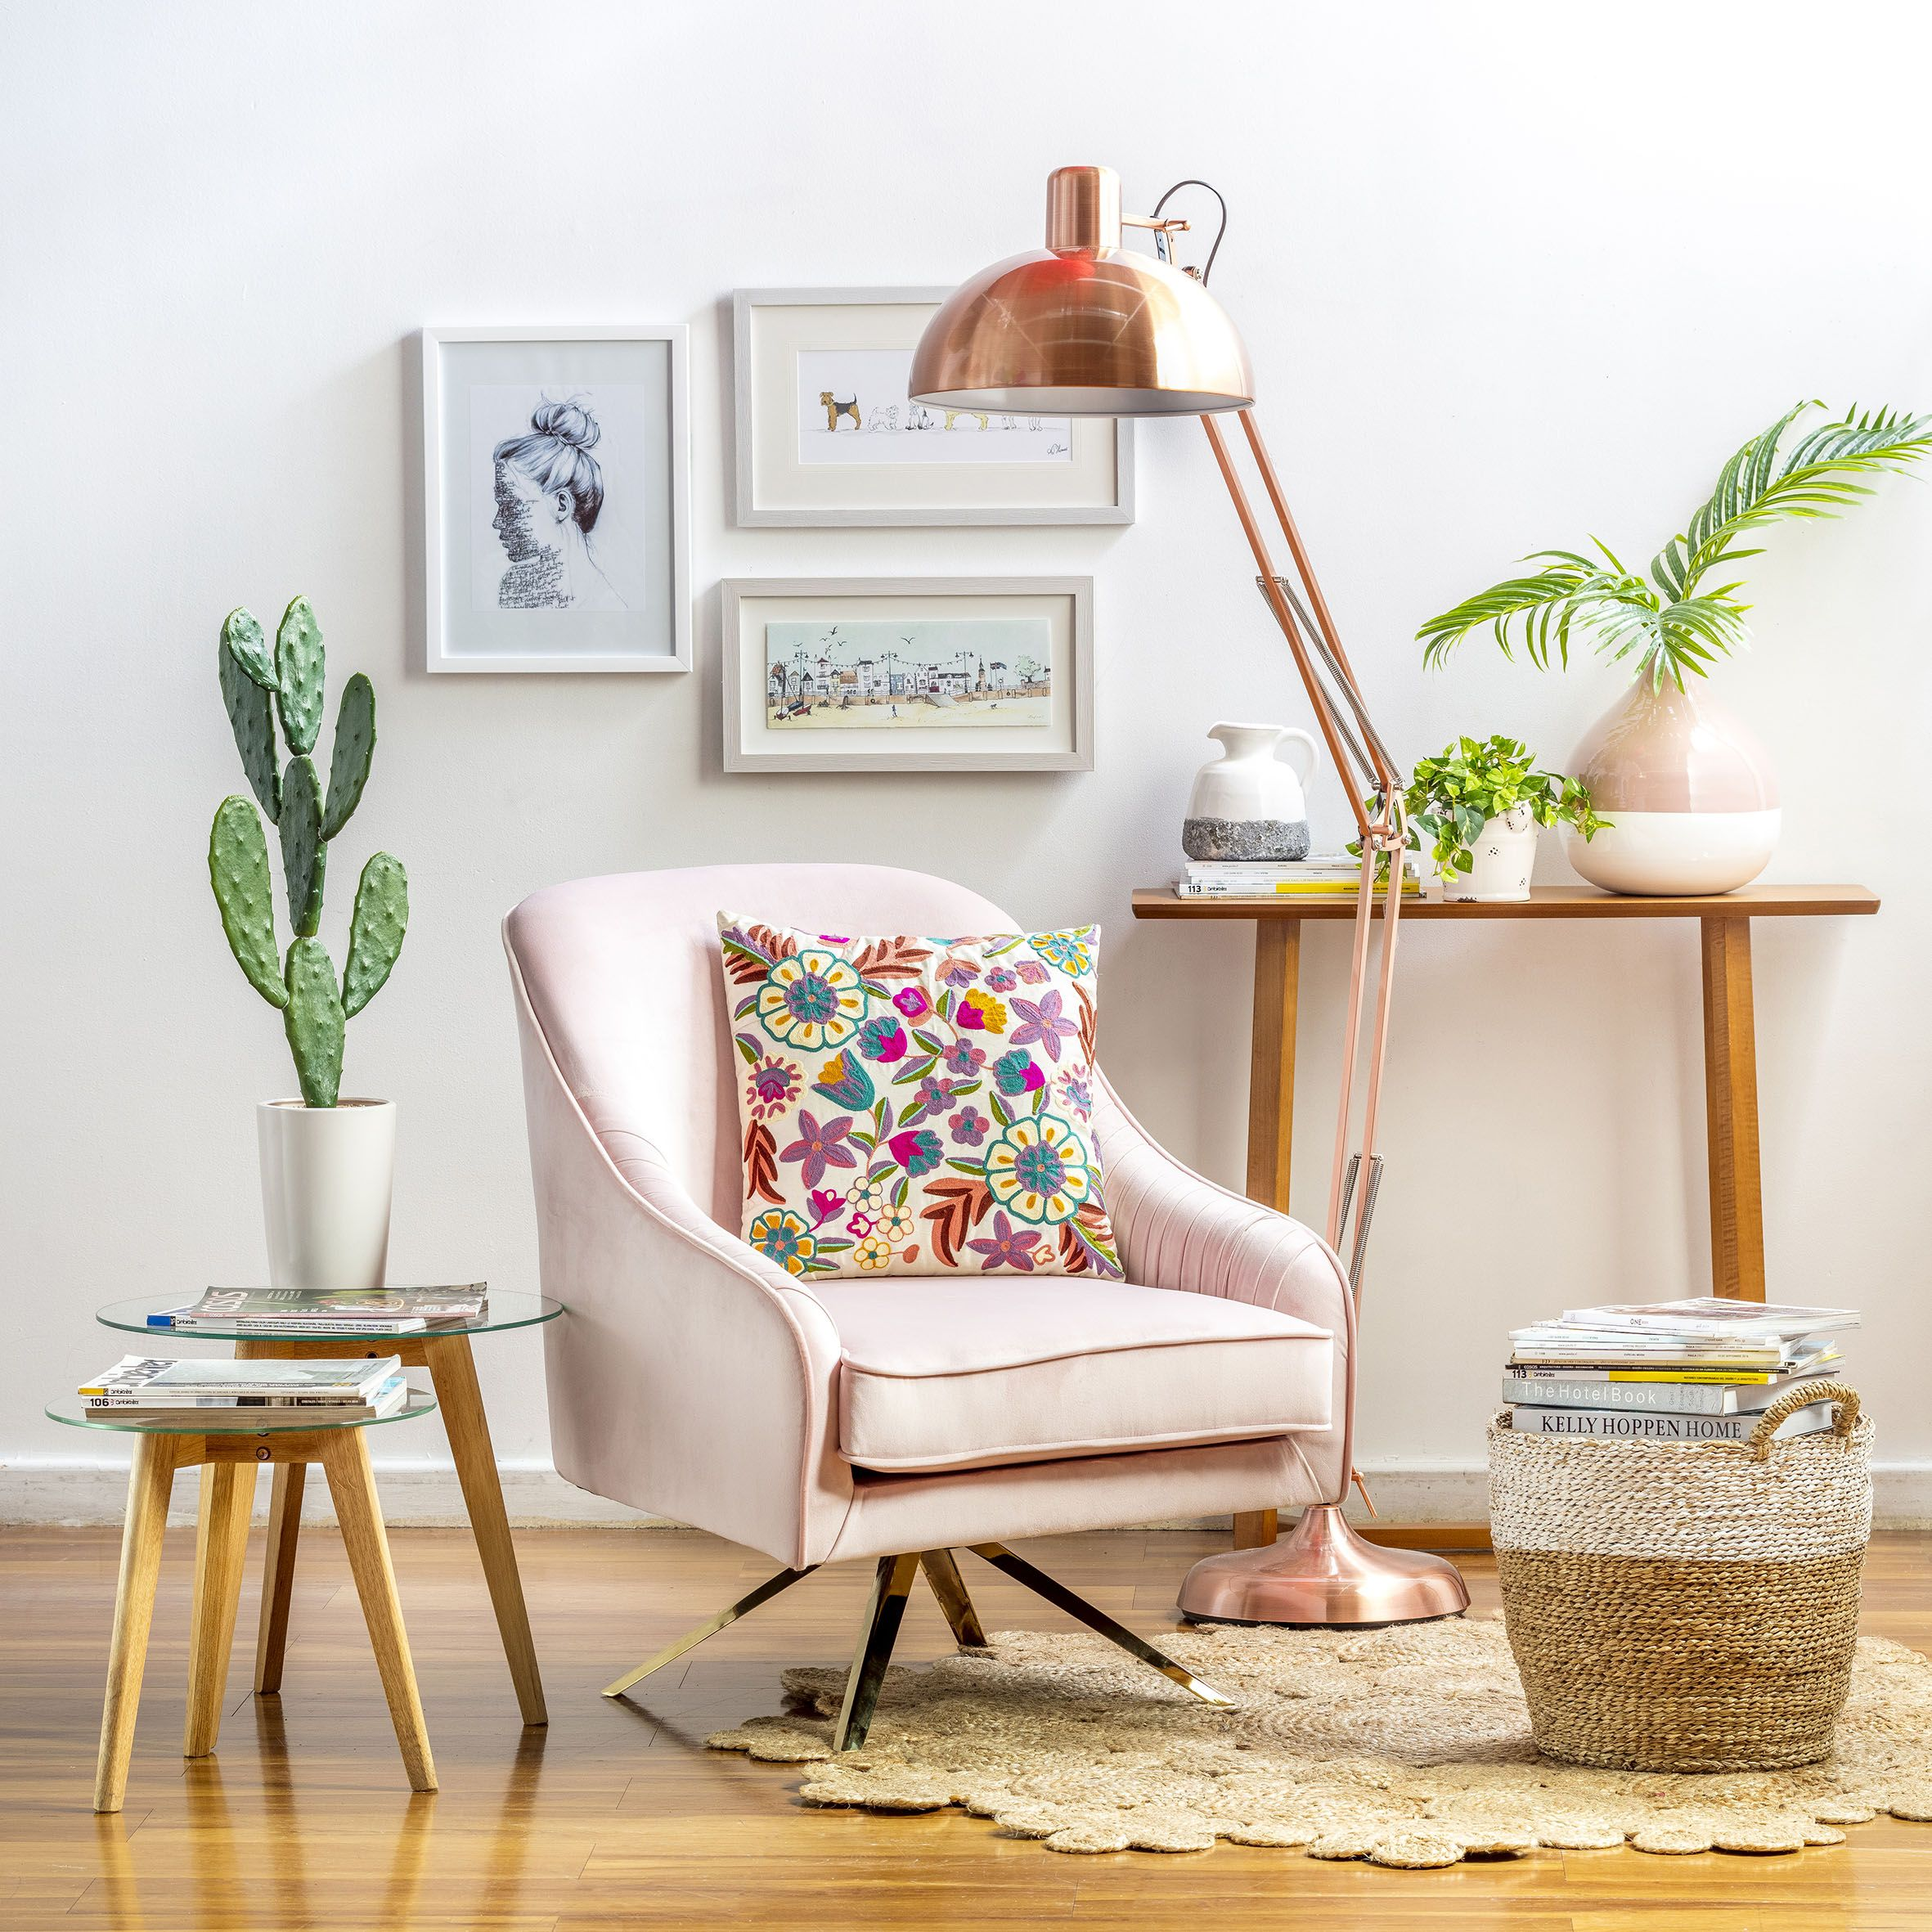 Homy poltrona 66x78x66 cm rosado en 2019 living y estar for Lamparas para apartamentos pequenos